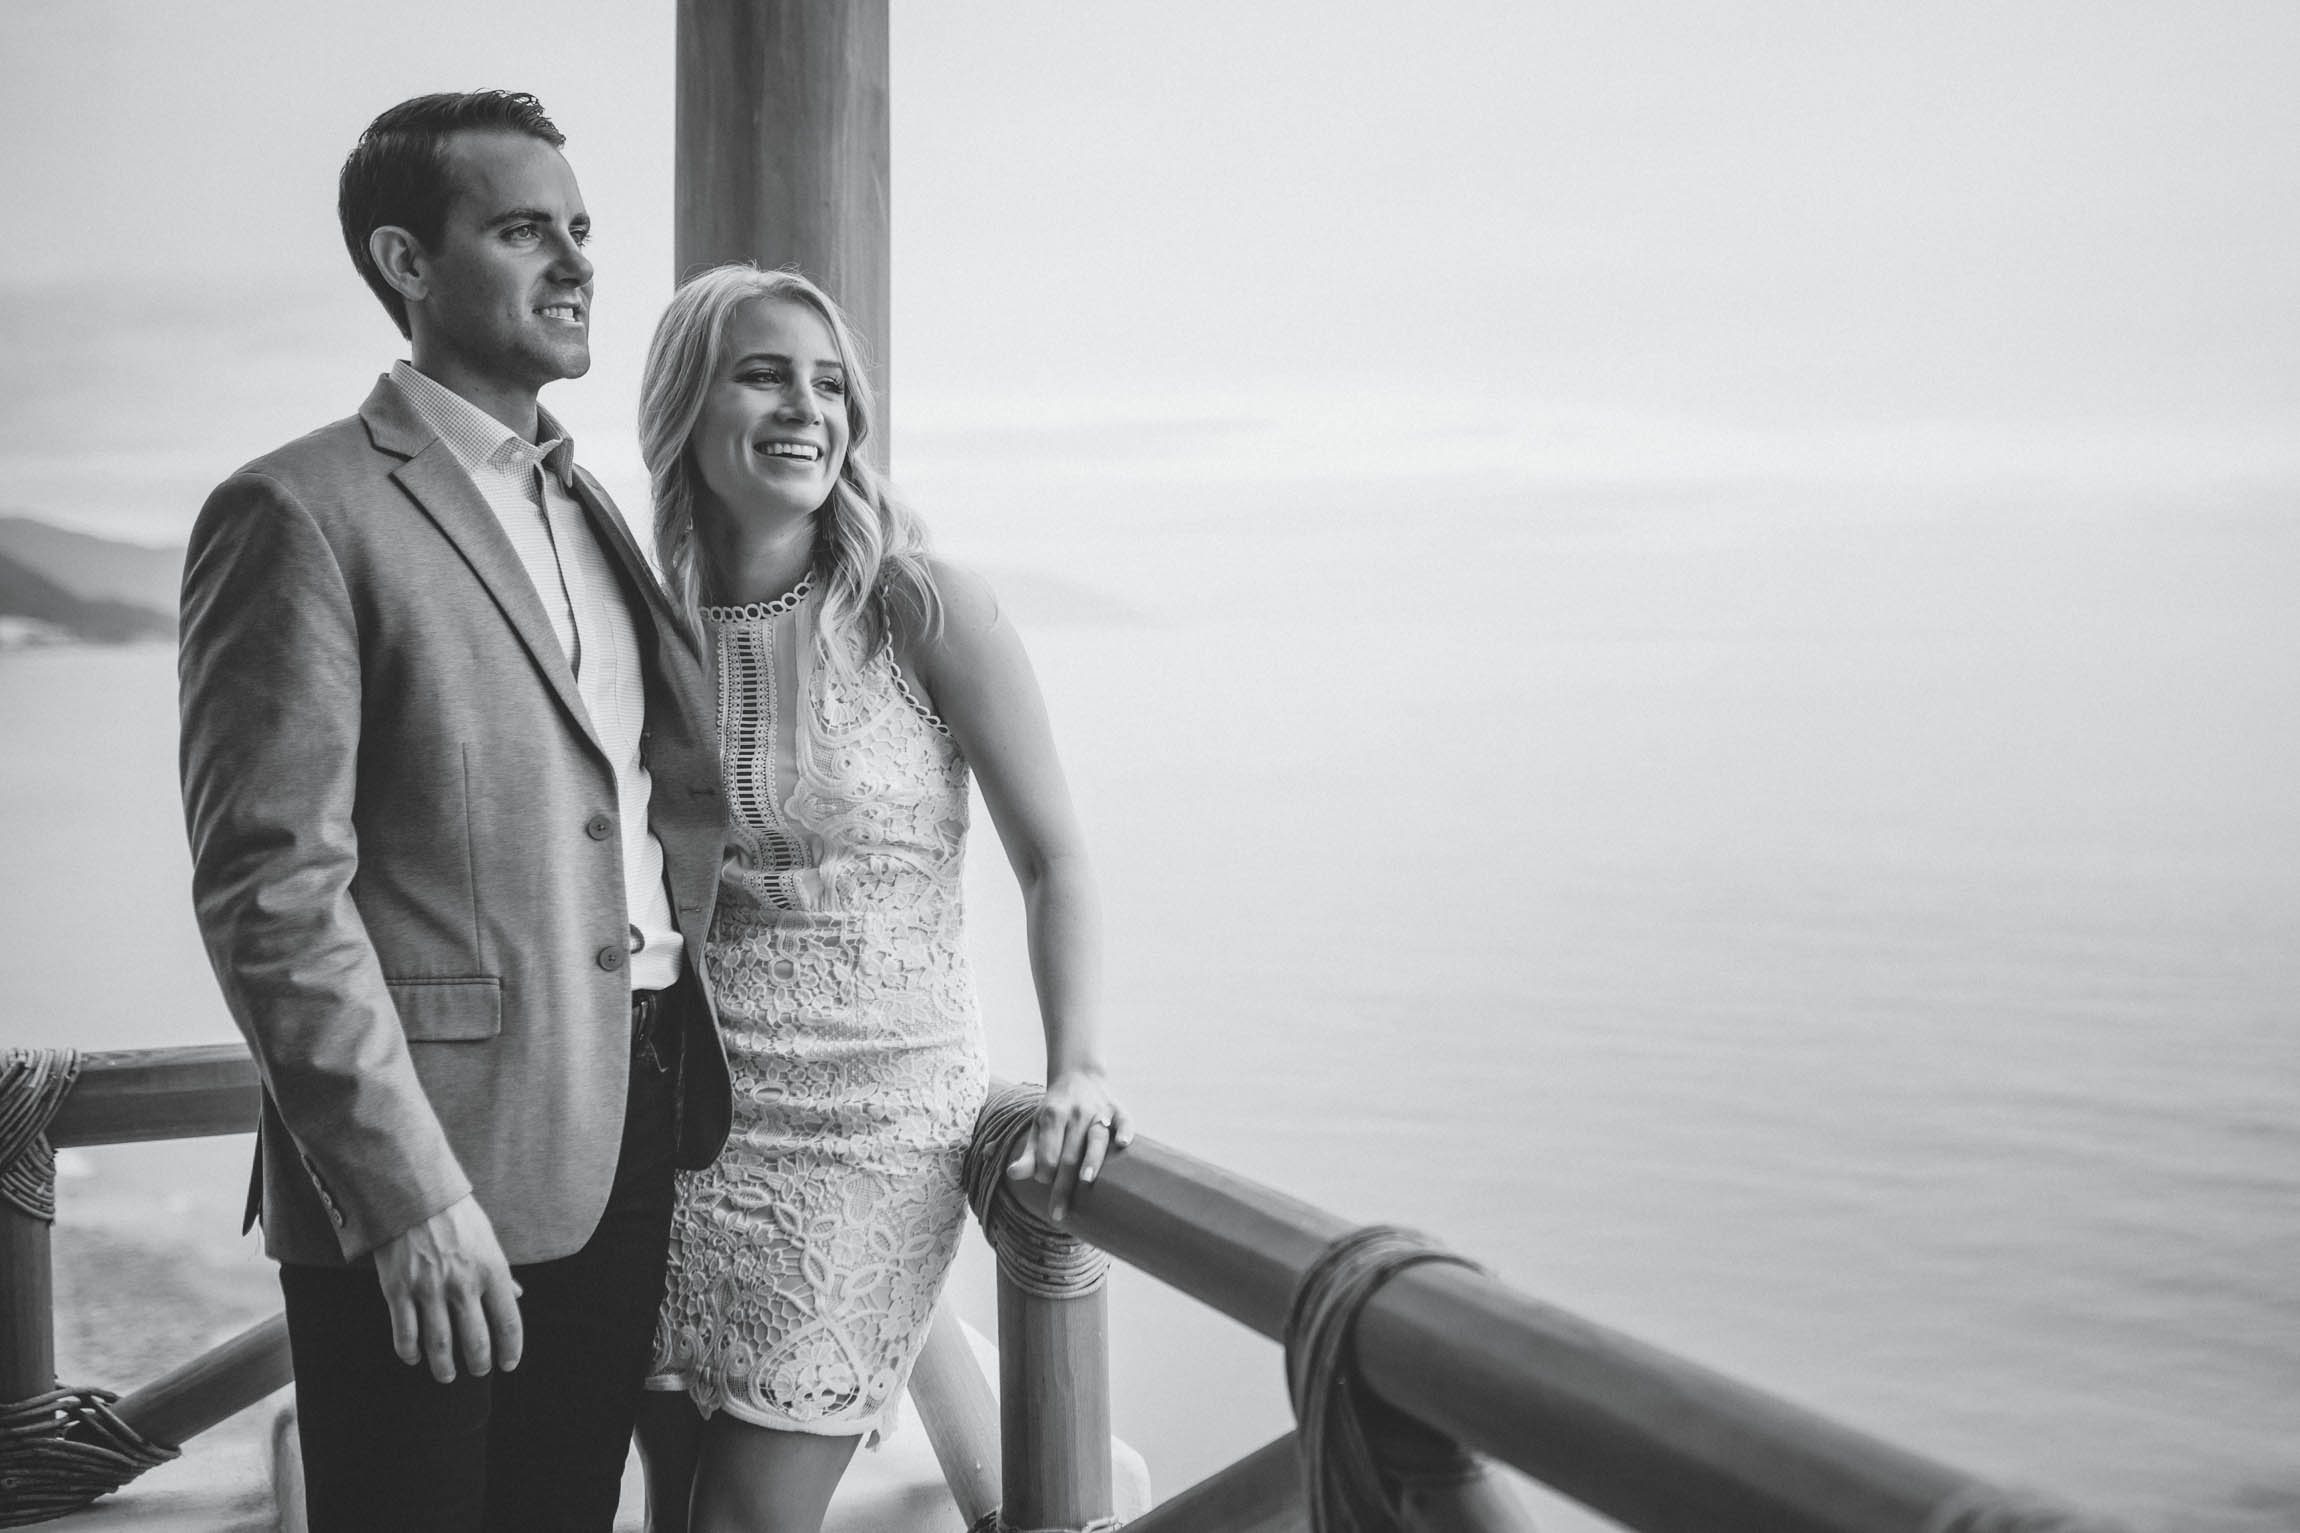 minnesota mexico destination wedding photographer-6.jpg